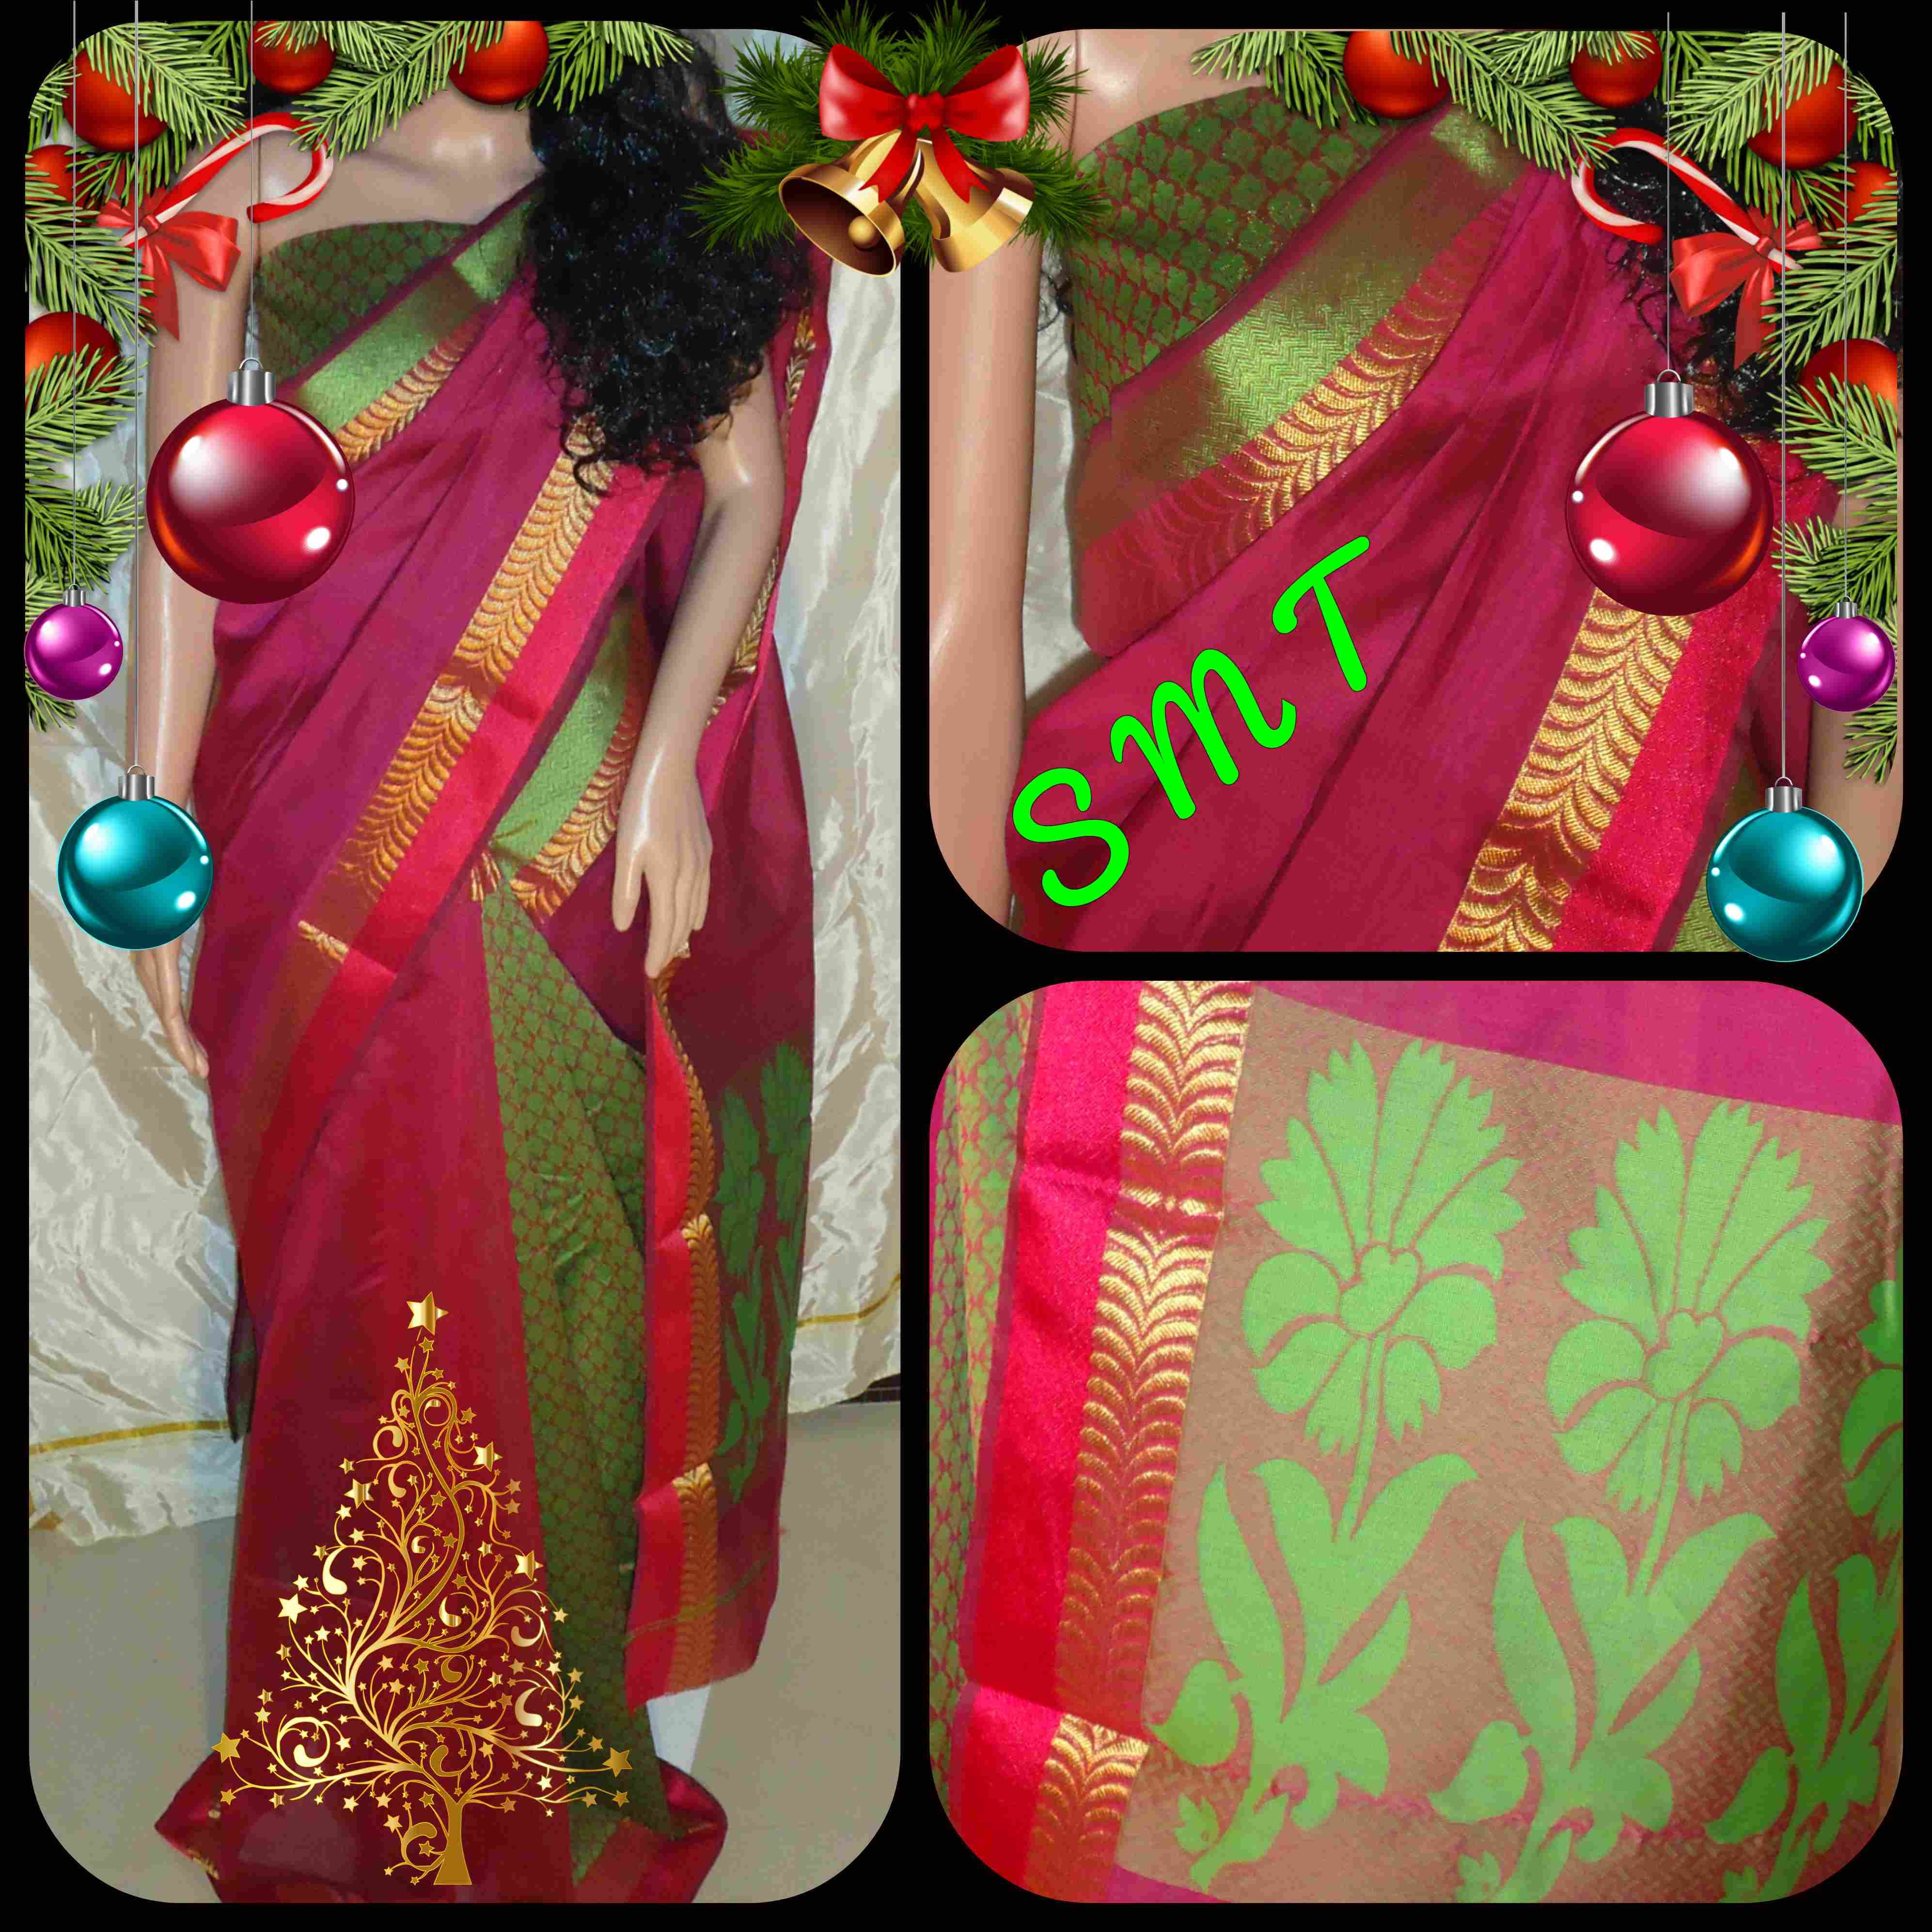 7027c26744052 🎄Fabric - Cora cotton sarees 🎄Blouse - Jacquard blouse 🎄Pallu -  Attractive Flower